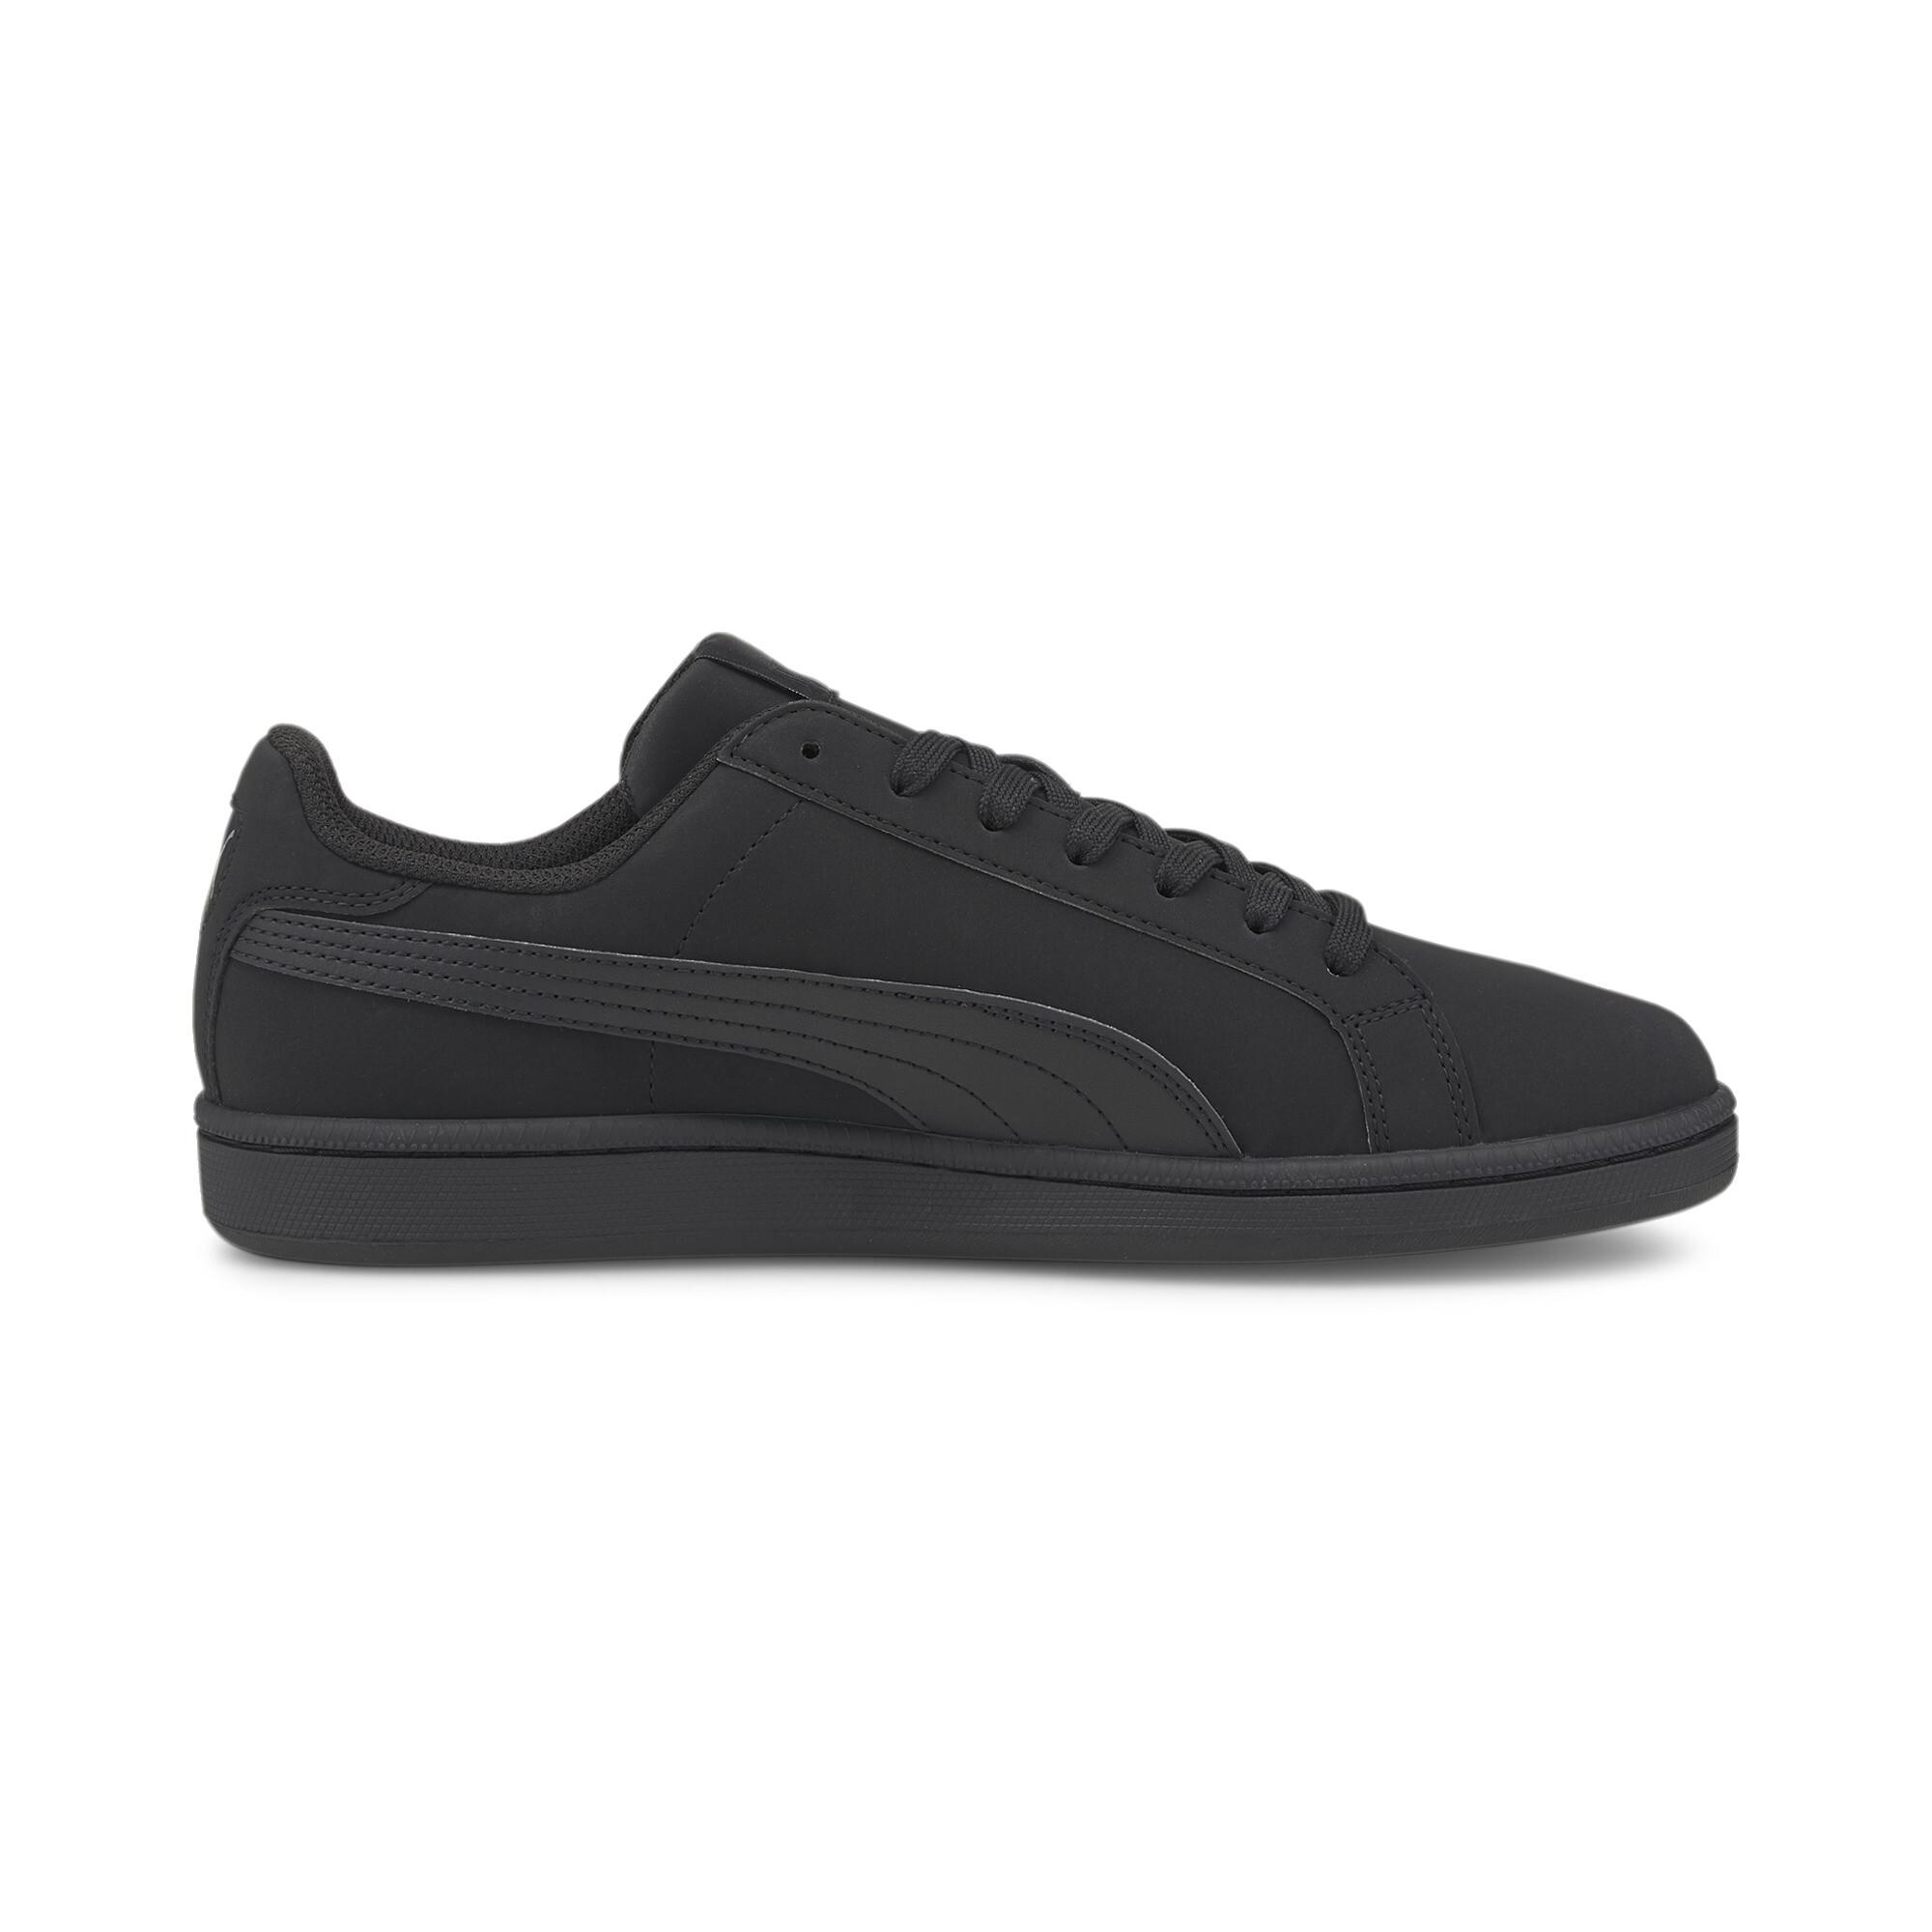 Indexbild 17 - PUMA Smash Buck Sneaker Unisex Schuhe Sport Classics Neu